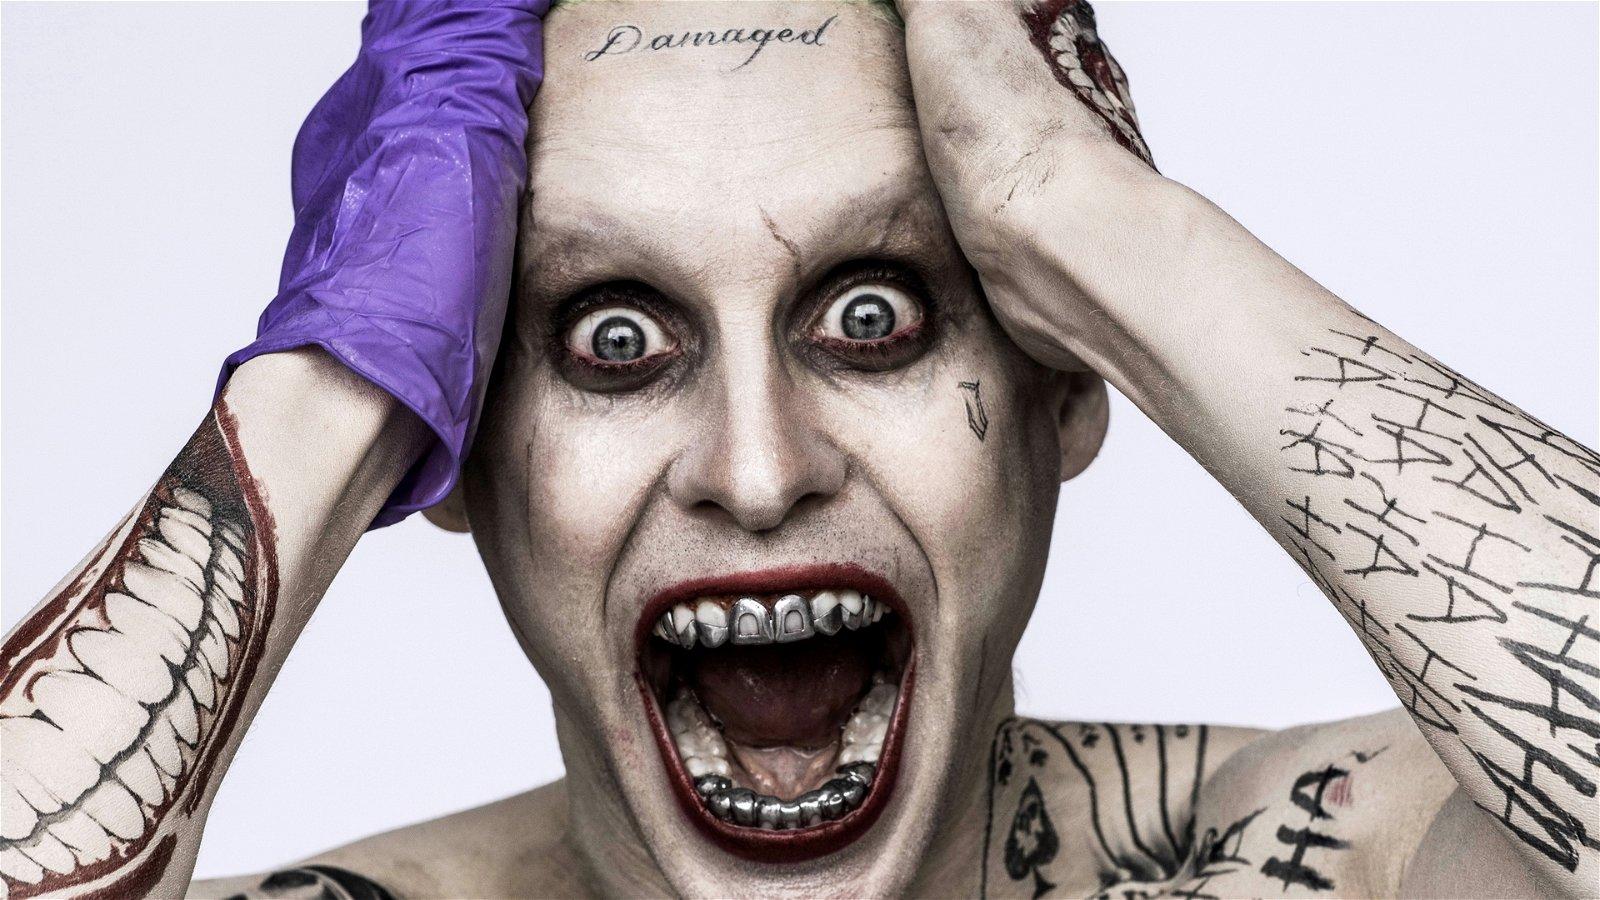 Warner Bros. Takes Aim at the Joker 4